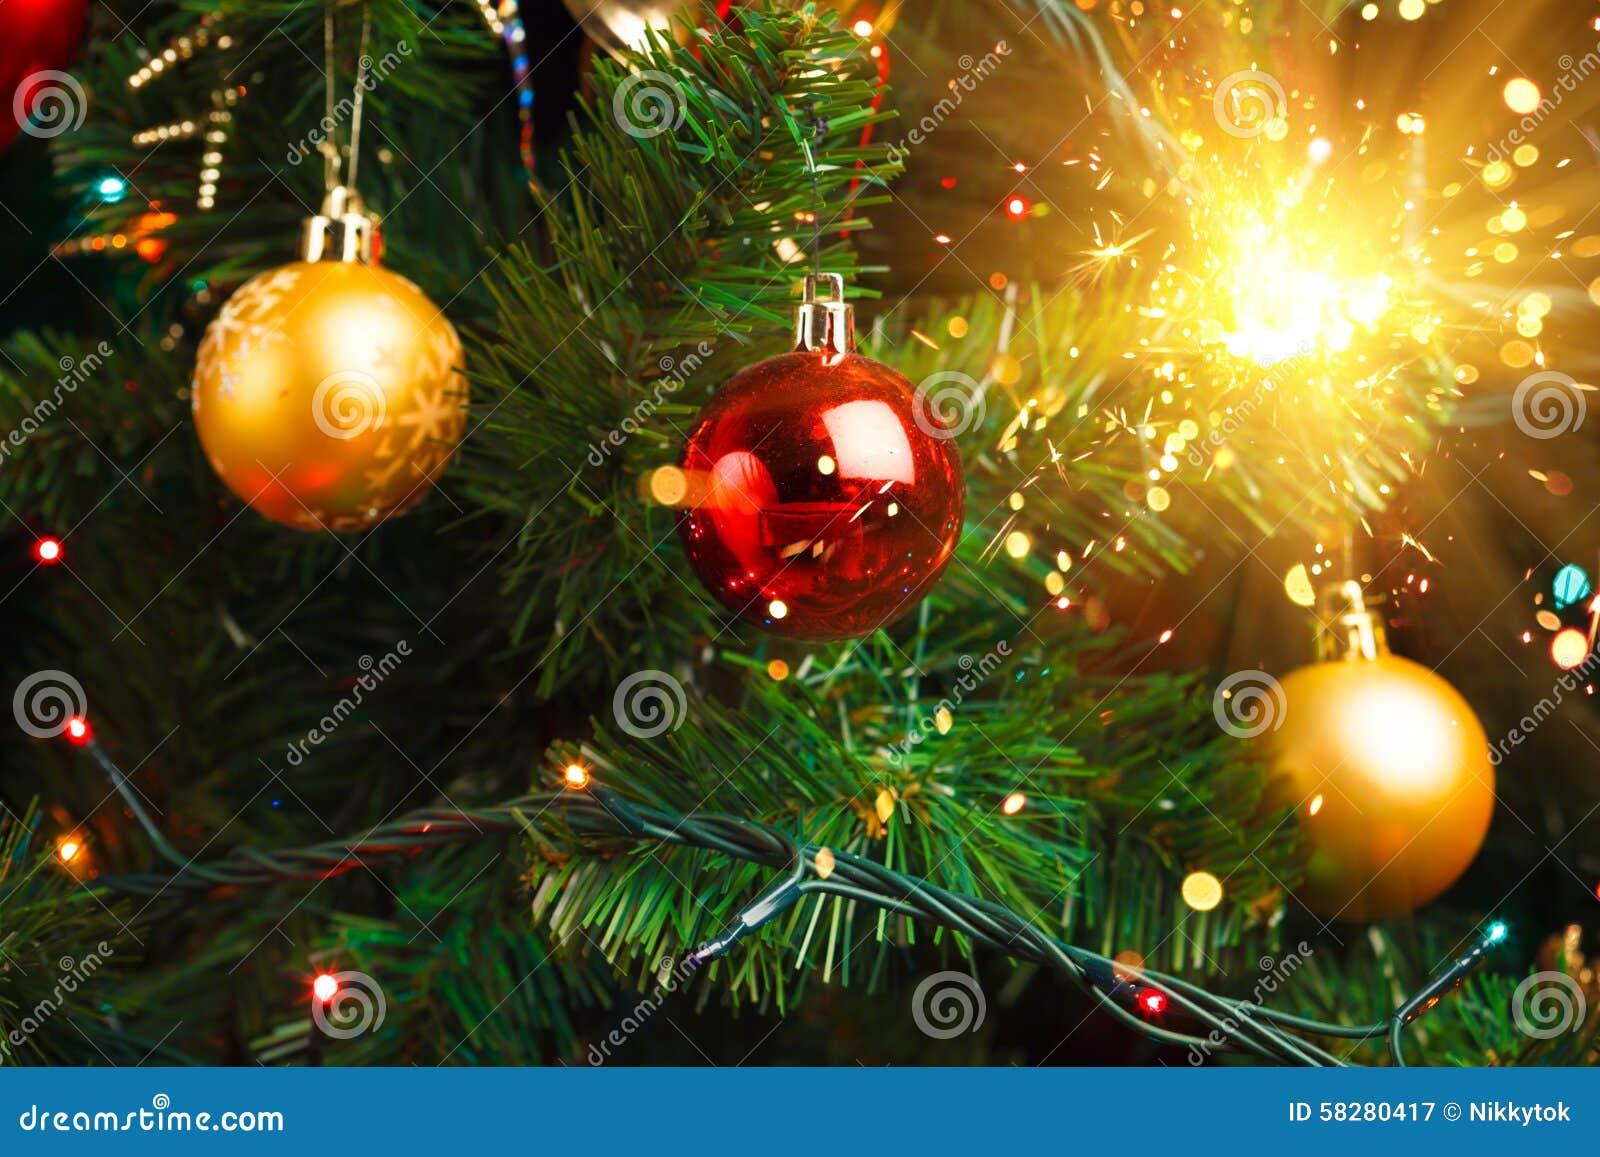 D coration d 39 arbre de no l avec le cierge magique brillant photo stock - Decoration arbre de noel ...